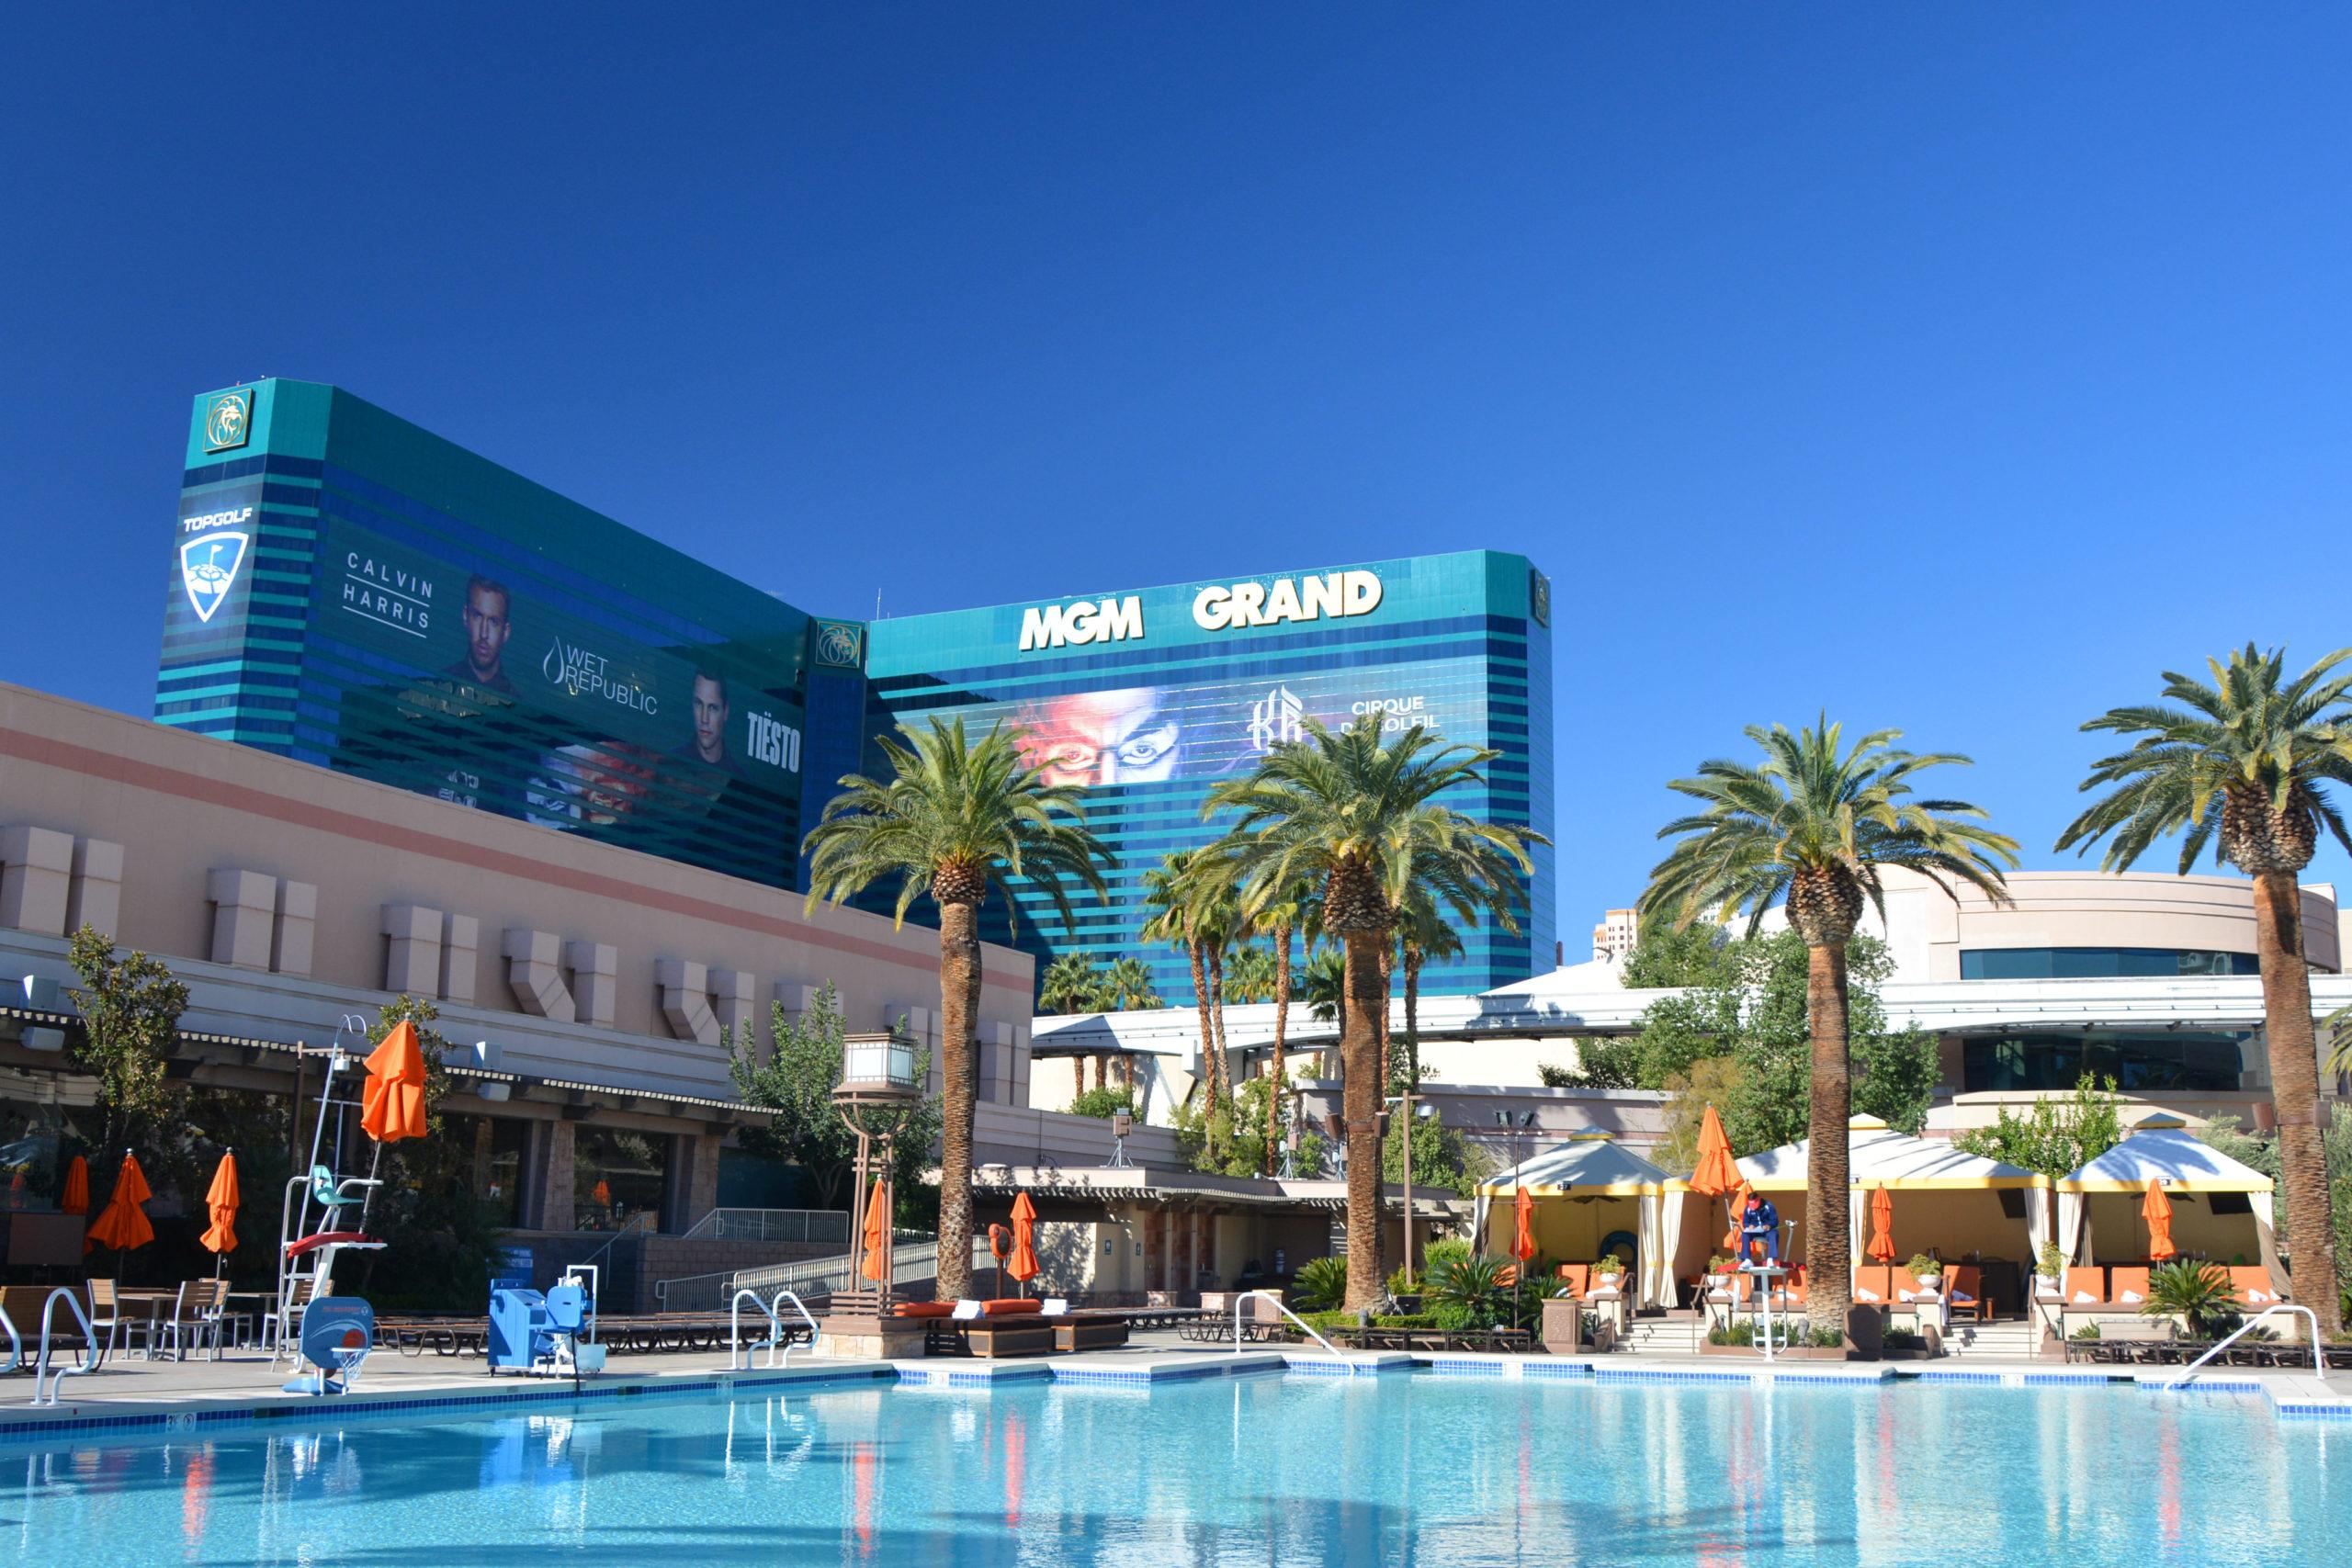 MGM Grand Hotel in Las Vegas, Nevada